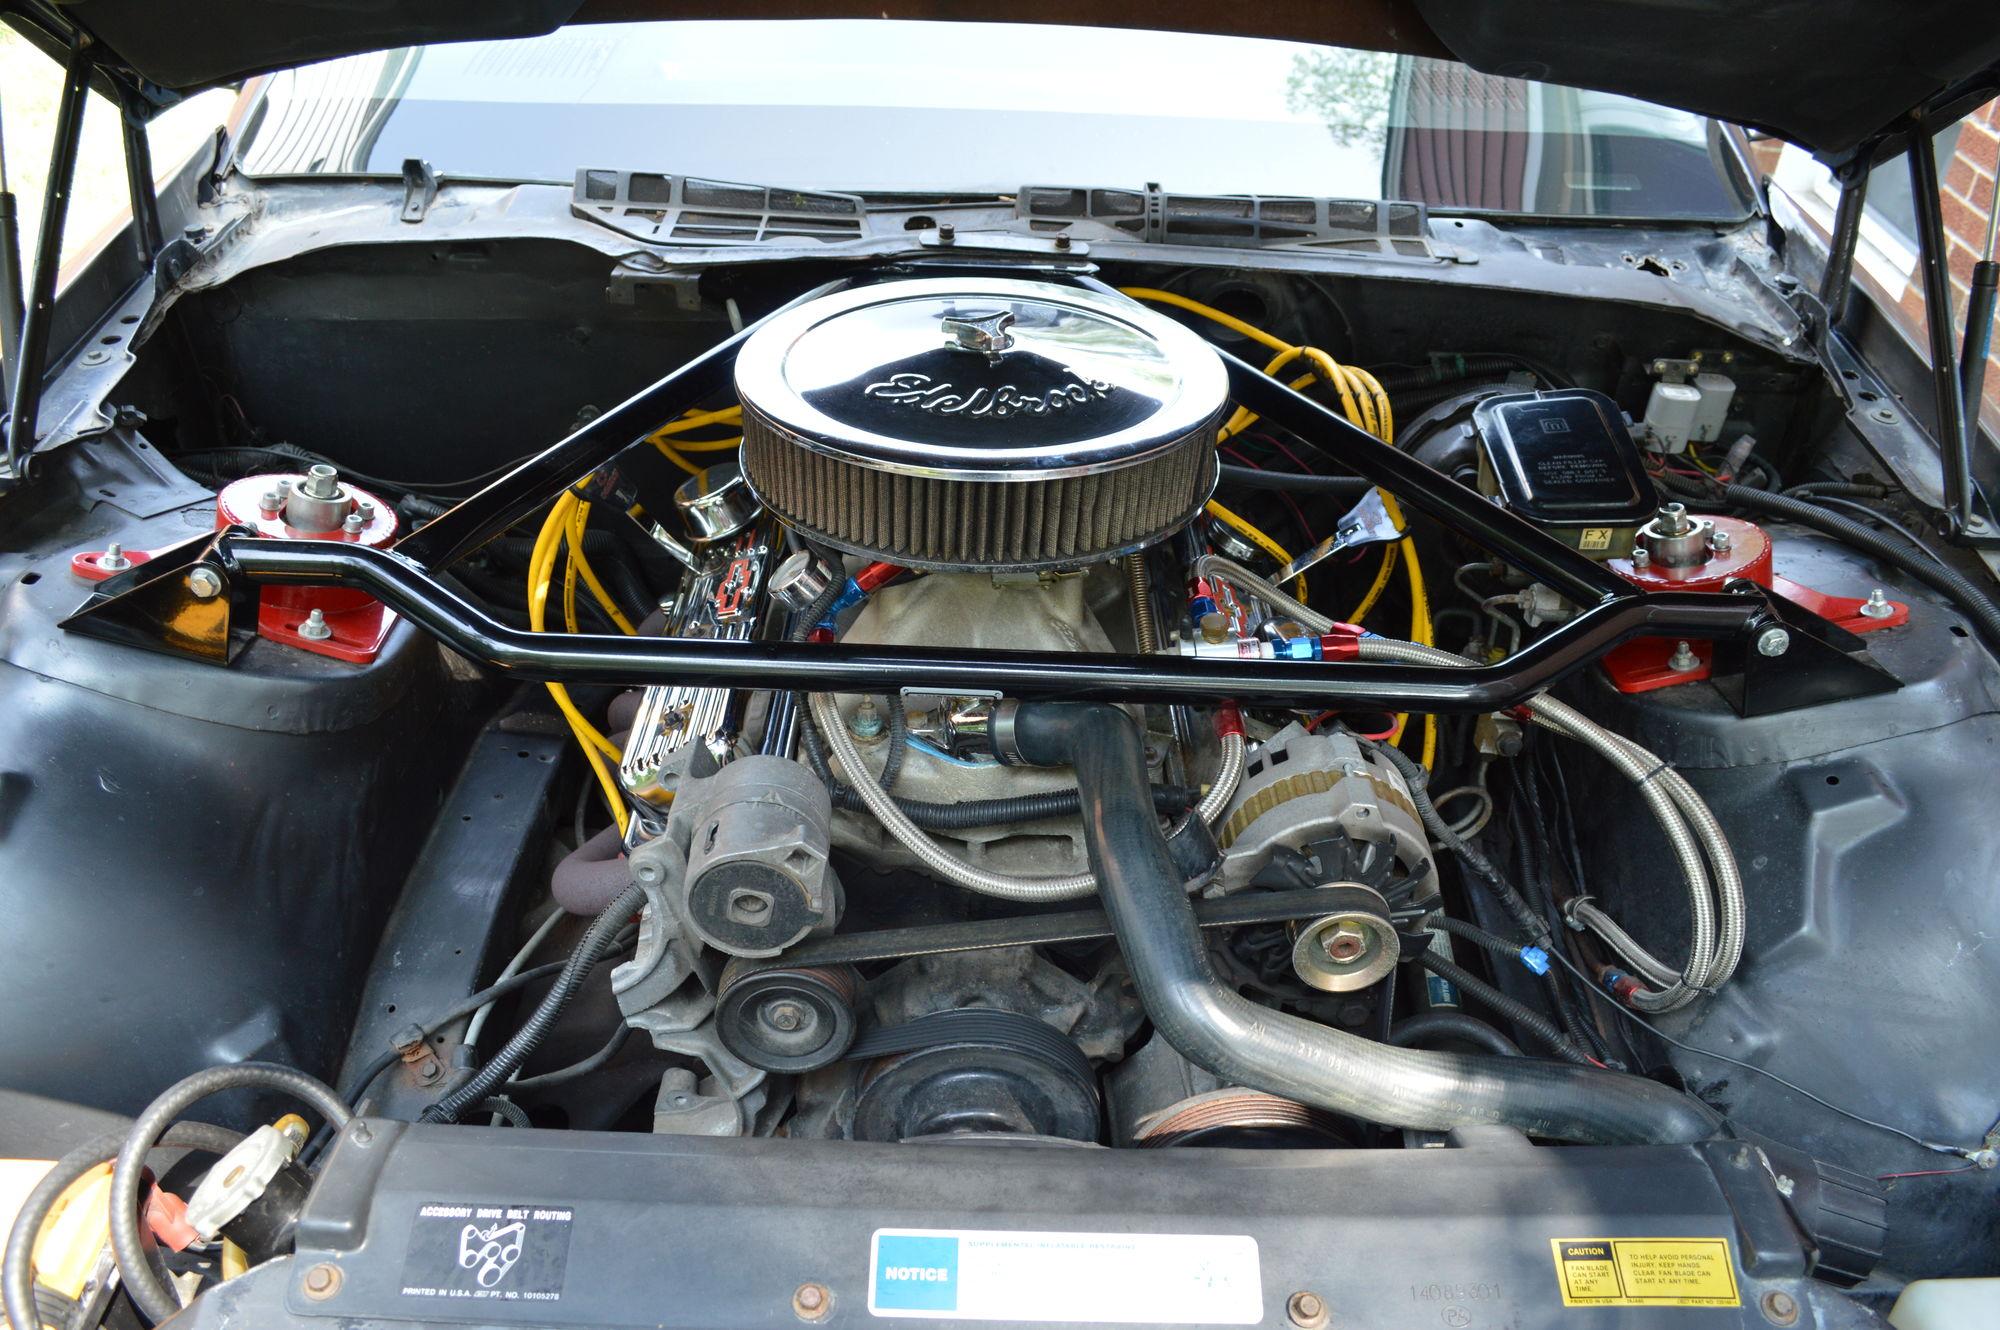 Illinois 1990 Camaro Rs Modified Third Generation F Body